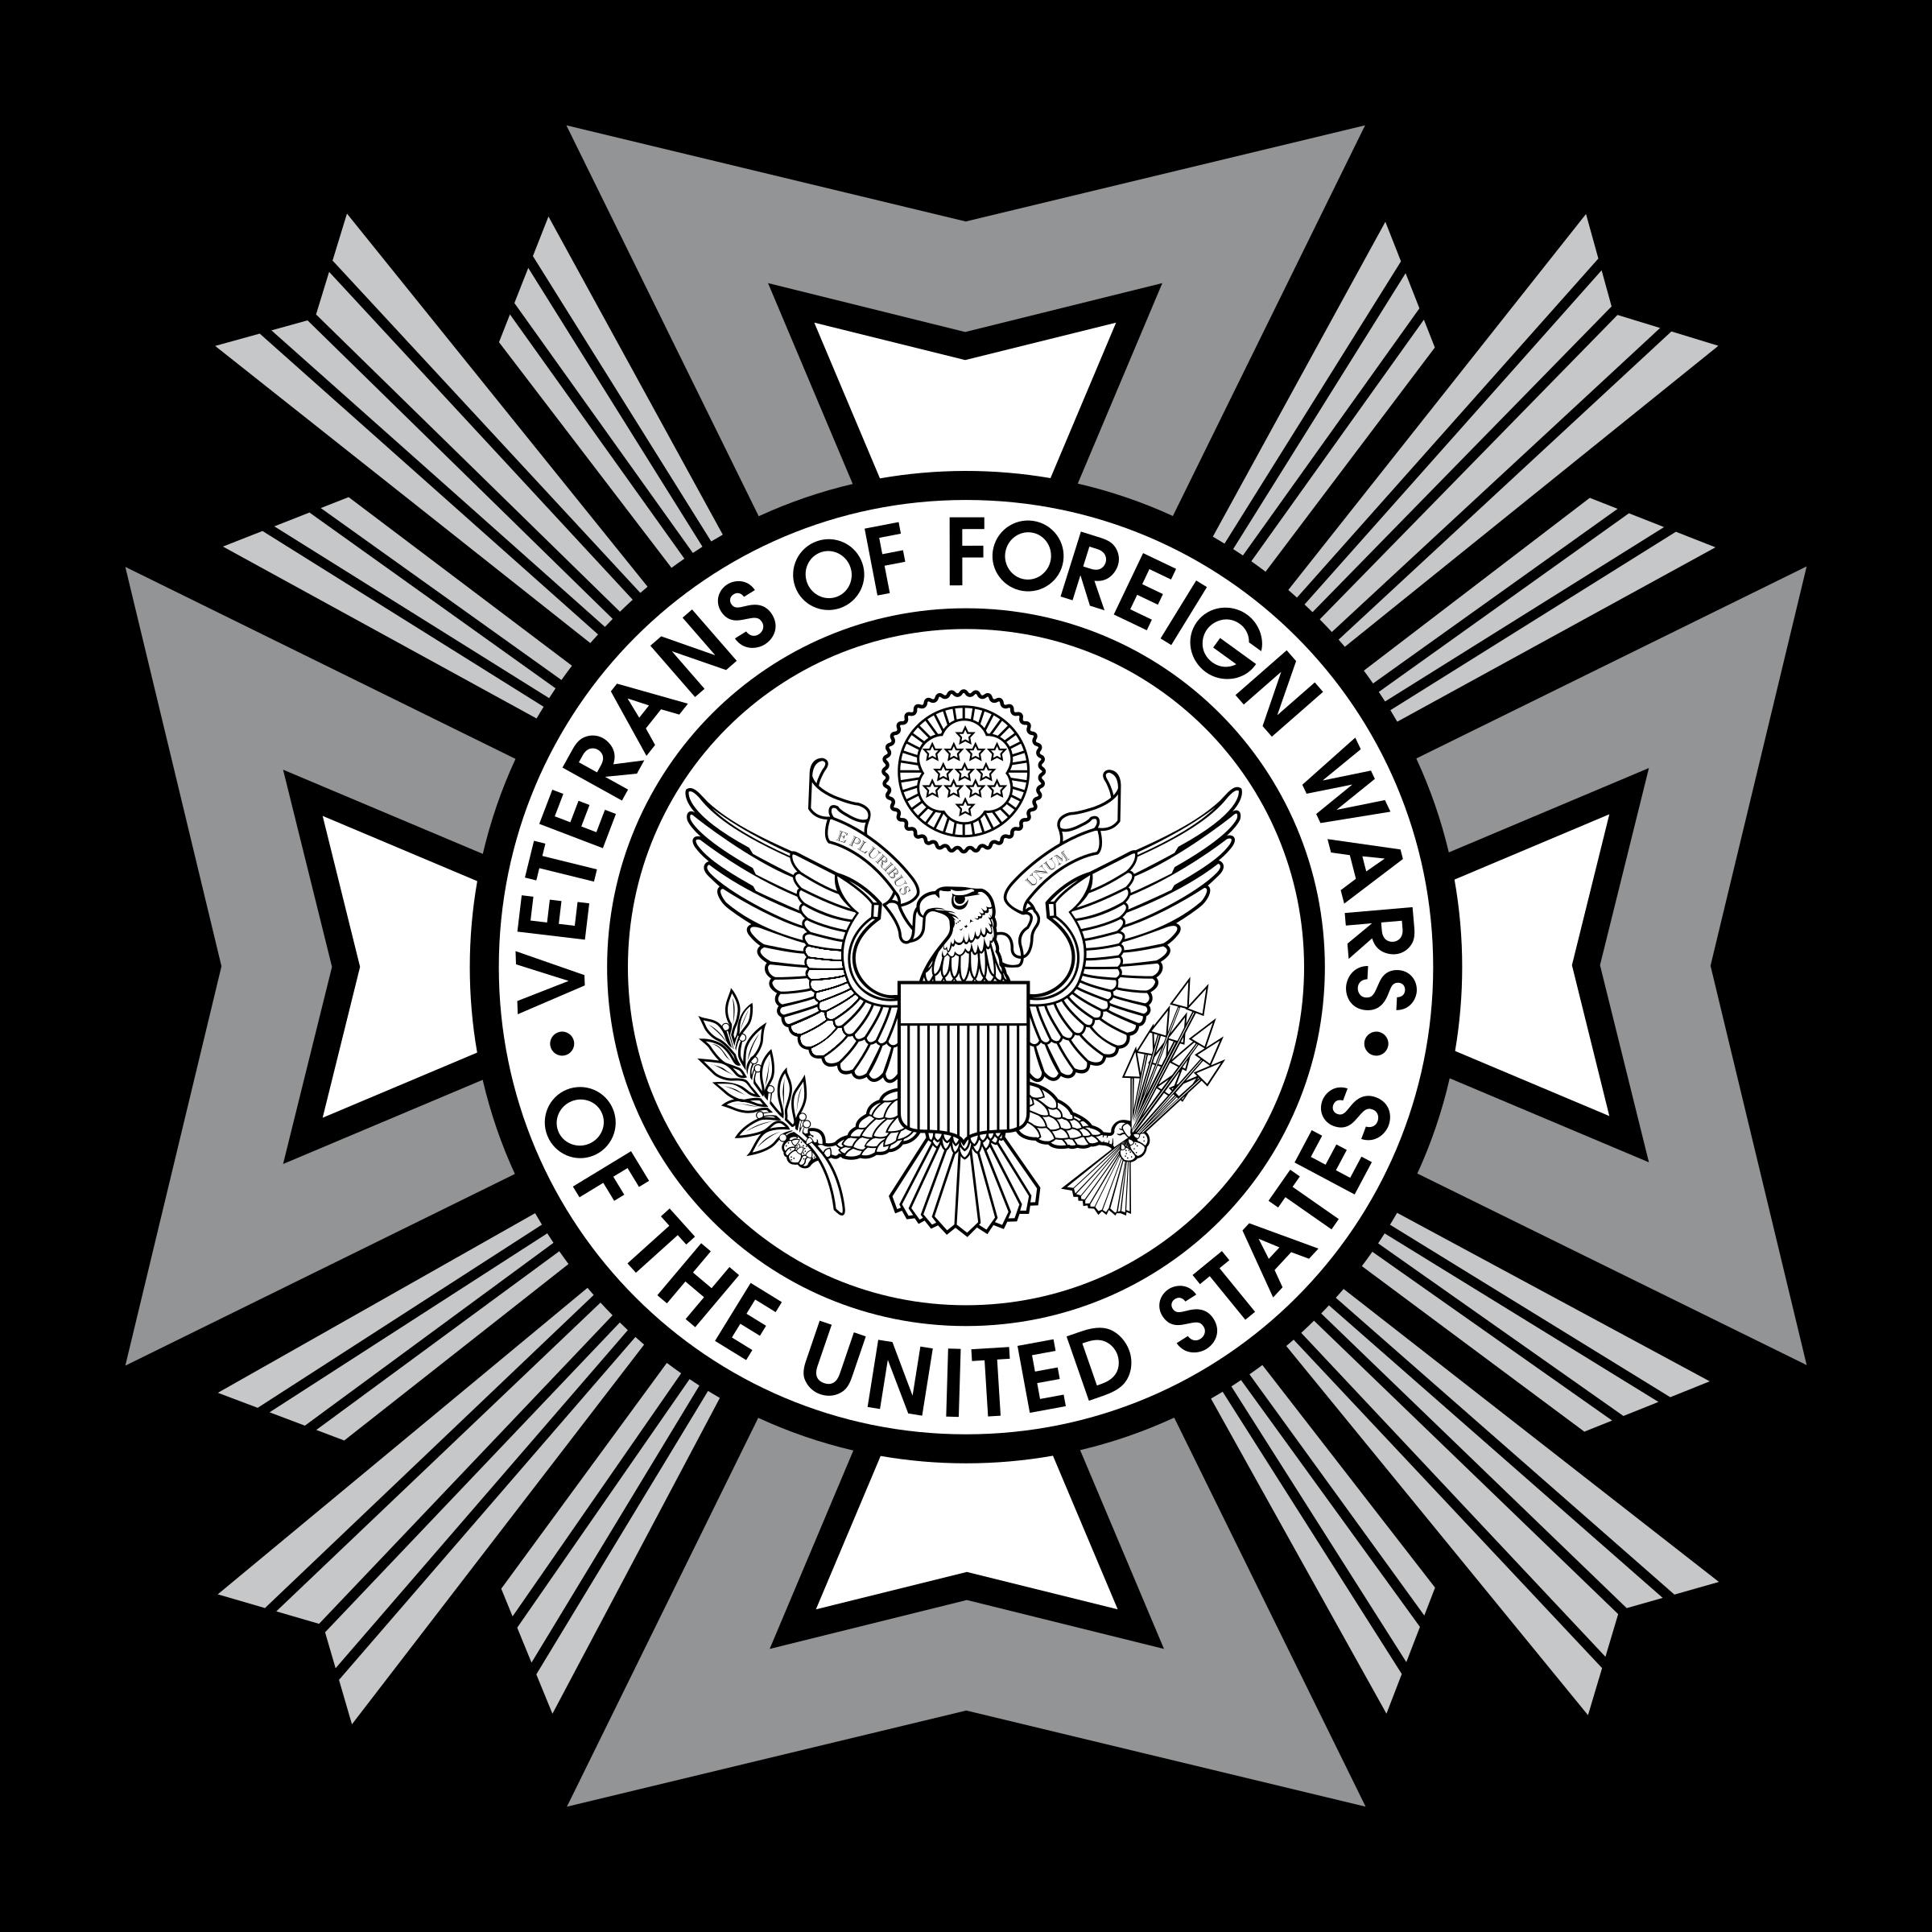 VFW Logo PNG Transparent & SVG Vector.